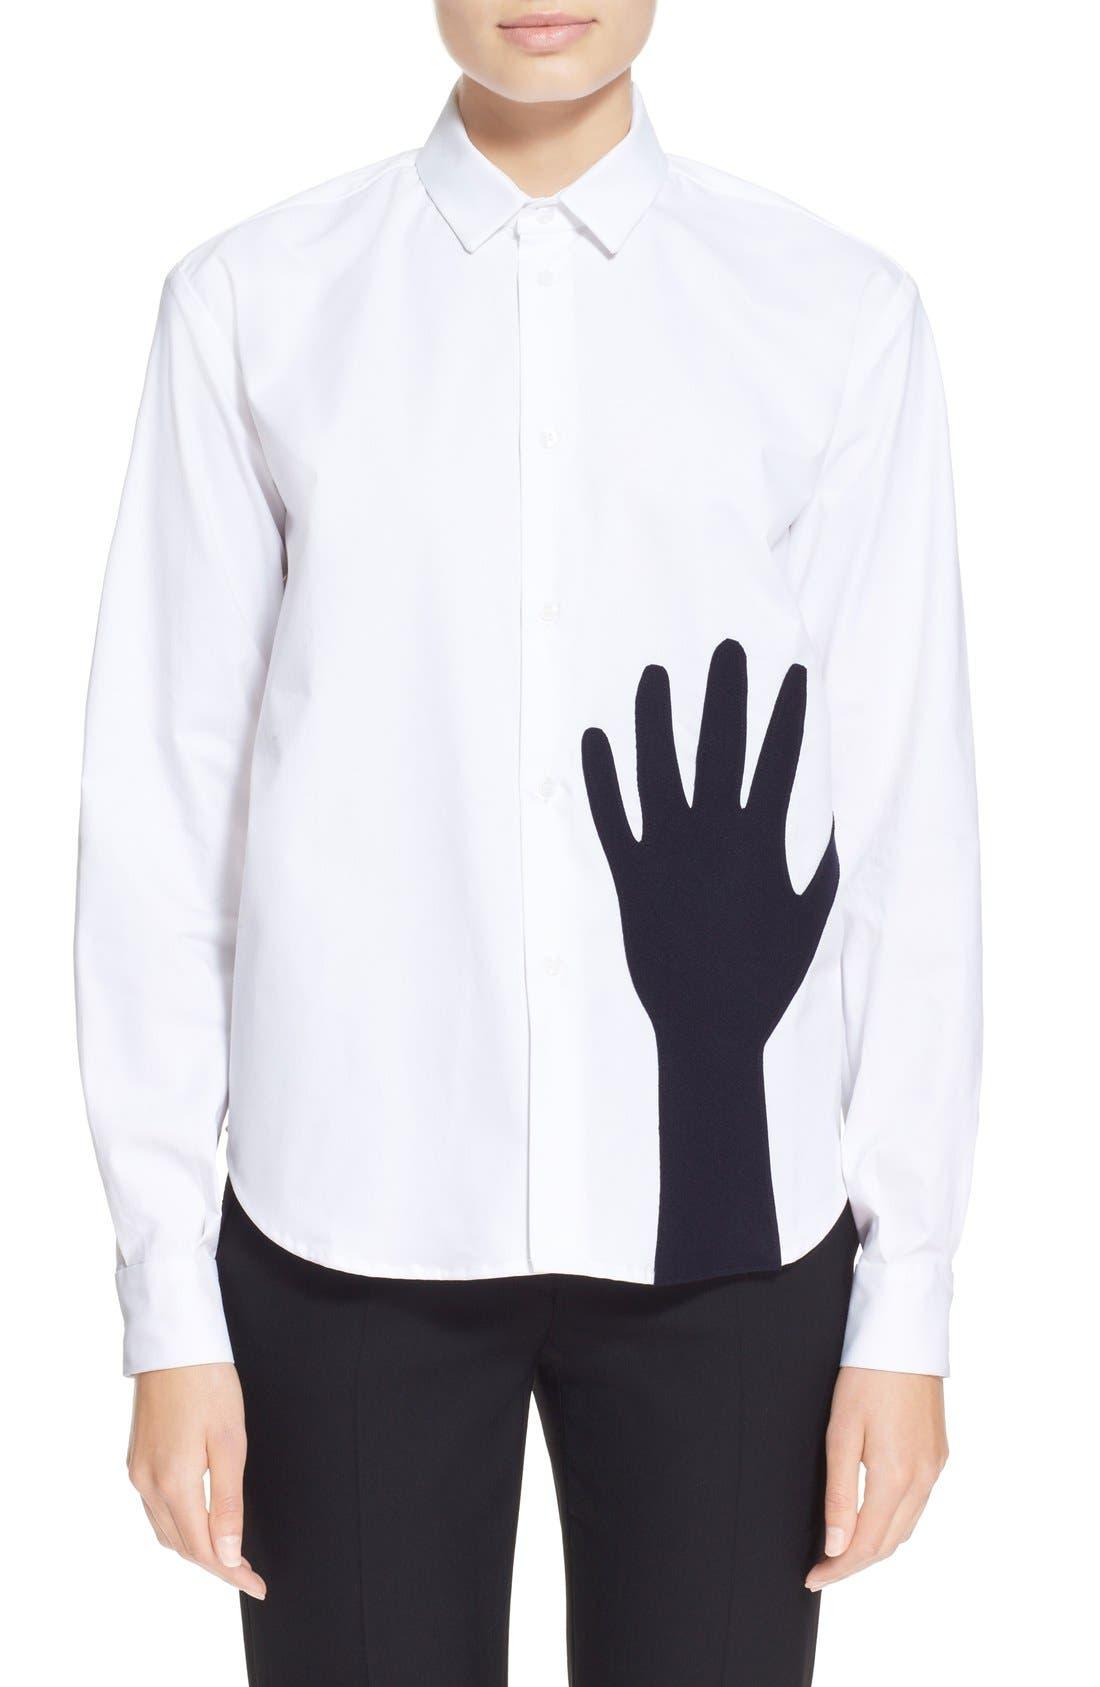 Main Image - JacquemusContrast Hand Stretch CottonShirt